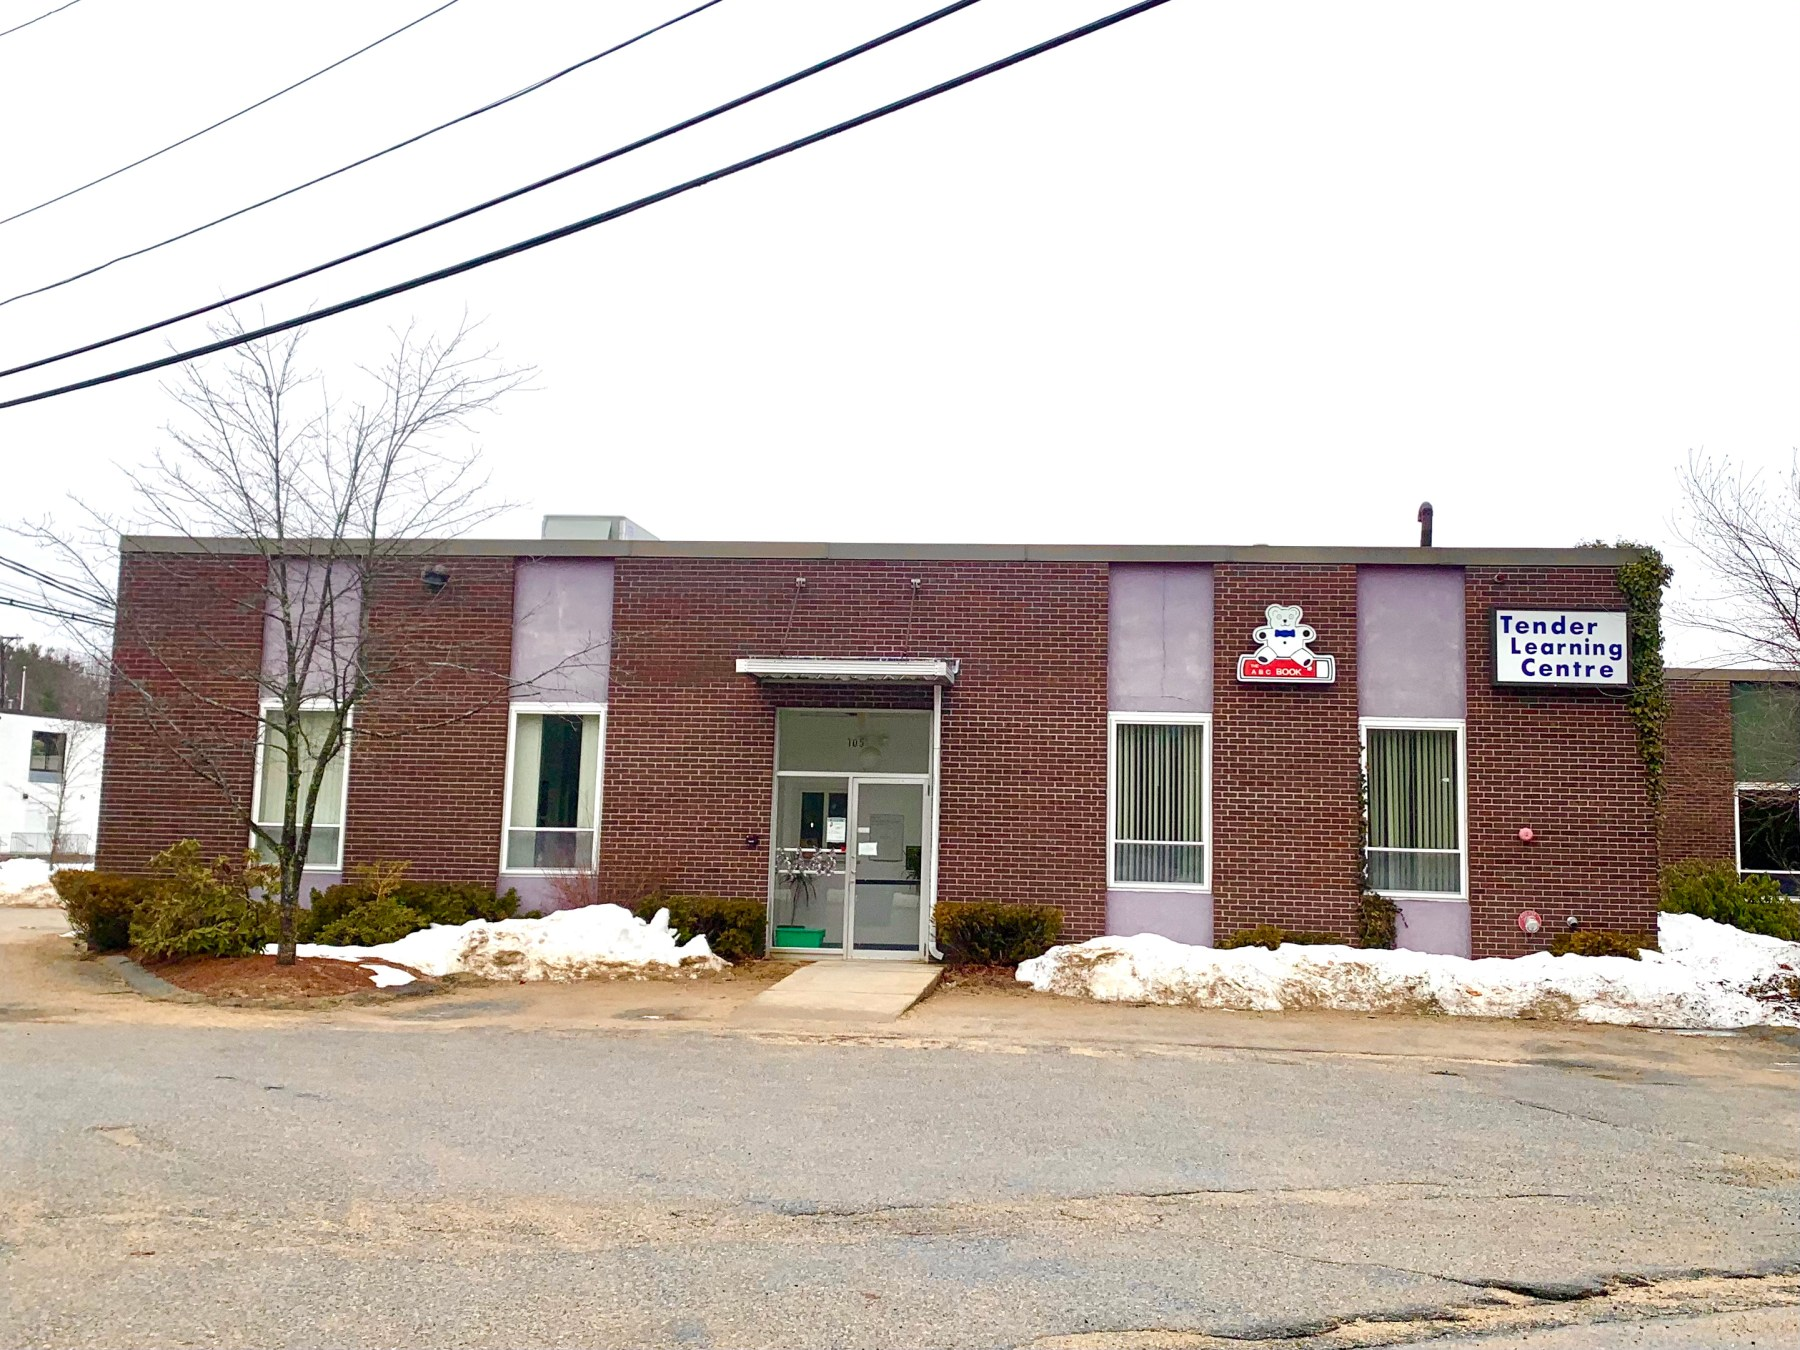 Tender Learning Center, 105 Terrace Hall Ave. Burlington, MA